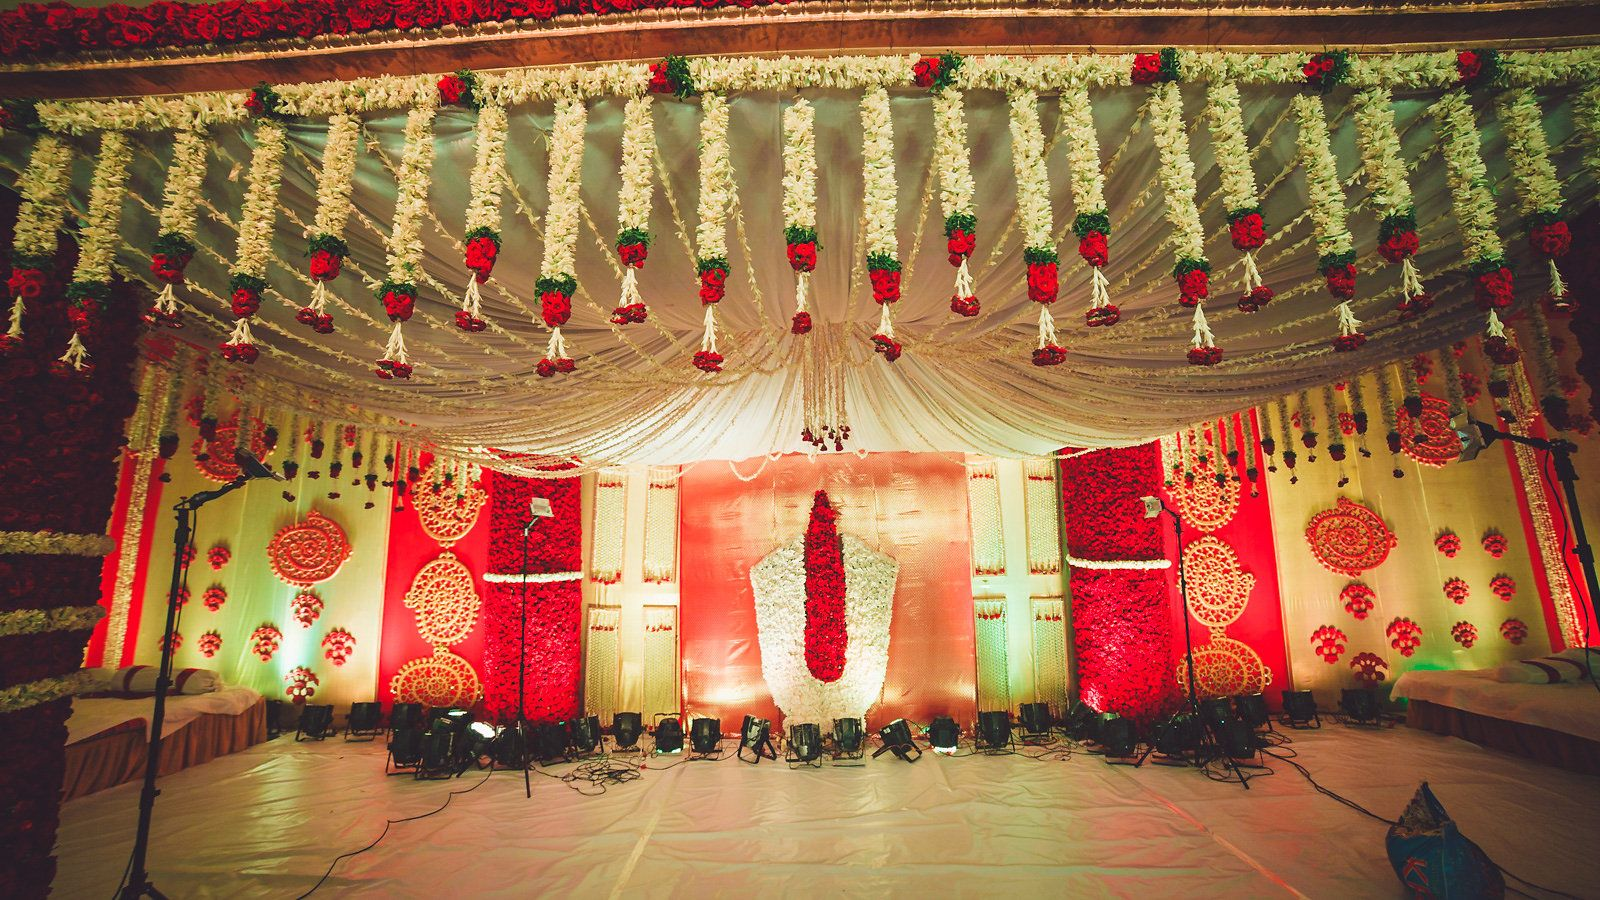 Kl weddng   kl weddng   Pinterest   Decoration, Wedding stage and ... for Pelli Mandapam Vedika Stage Decorations  555kxo